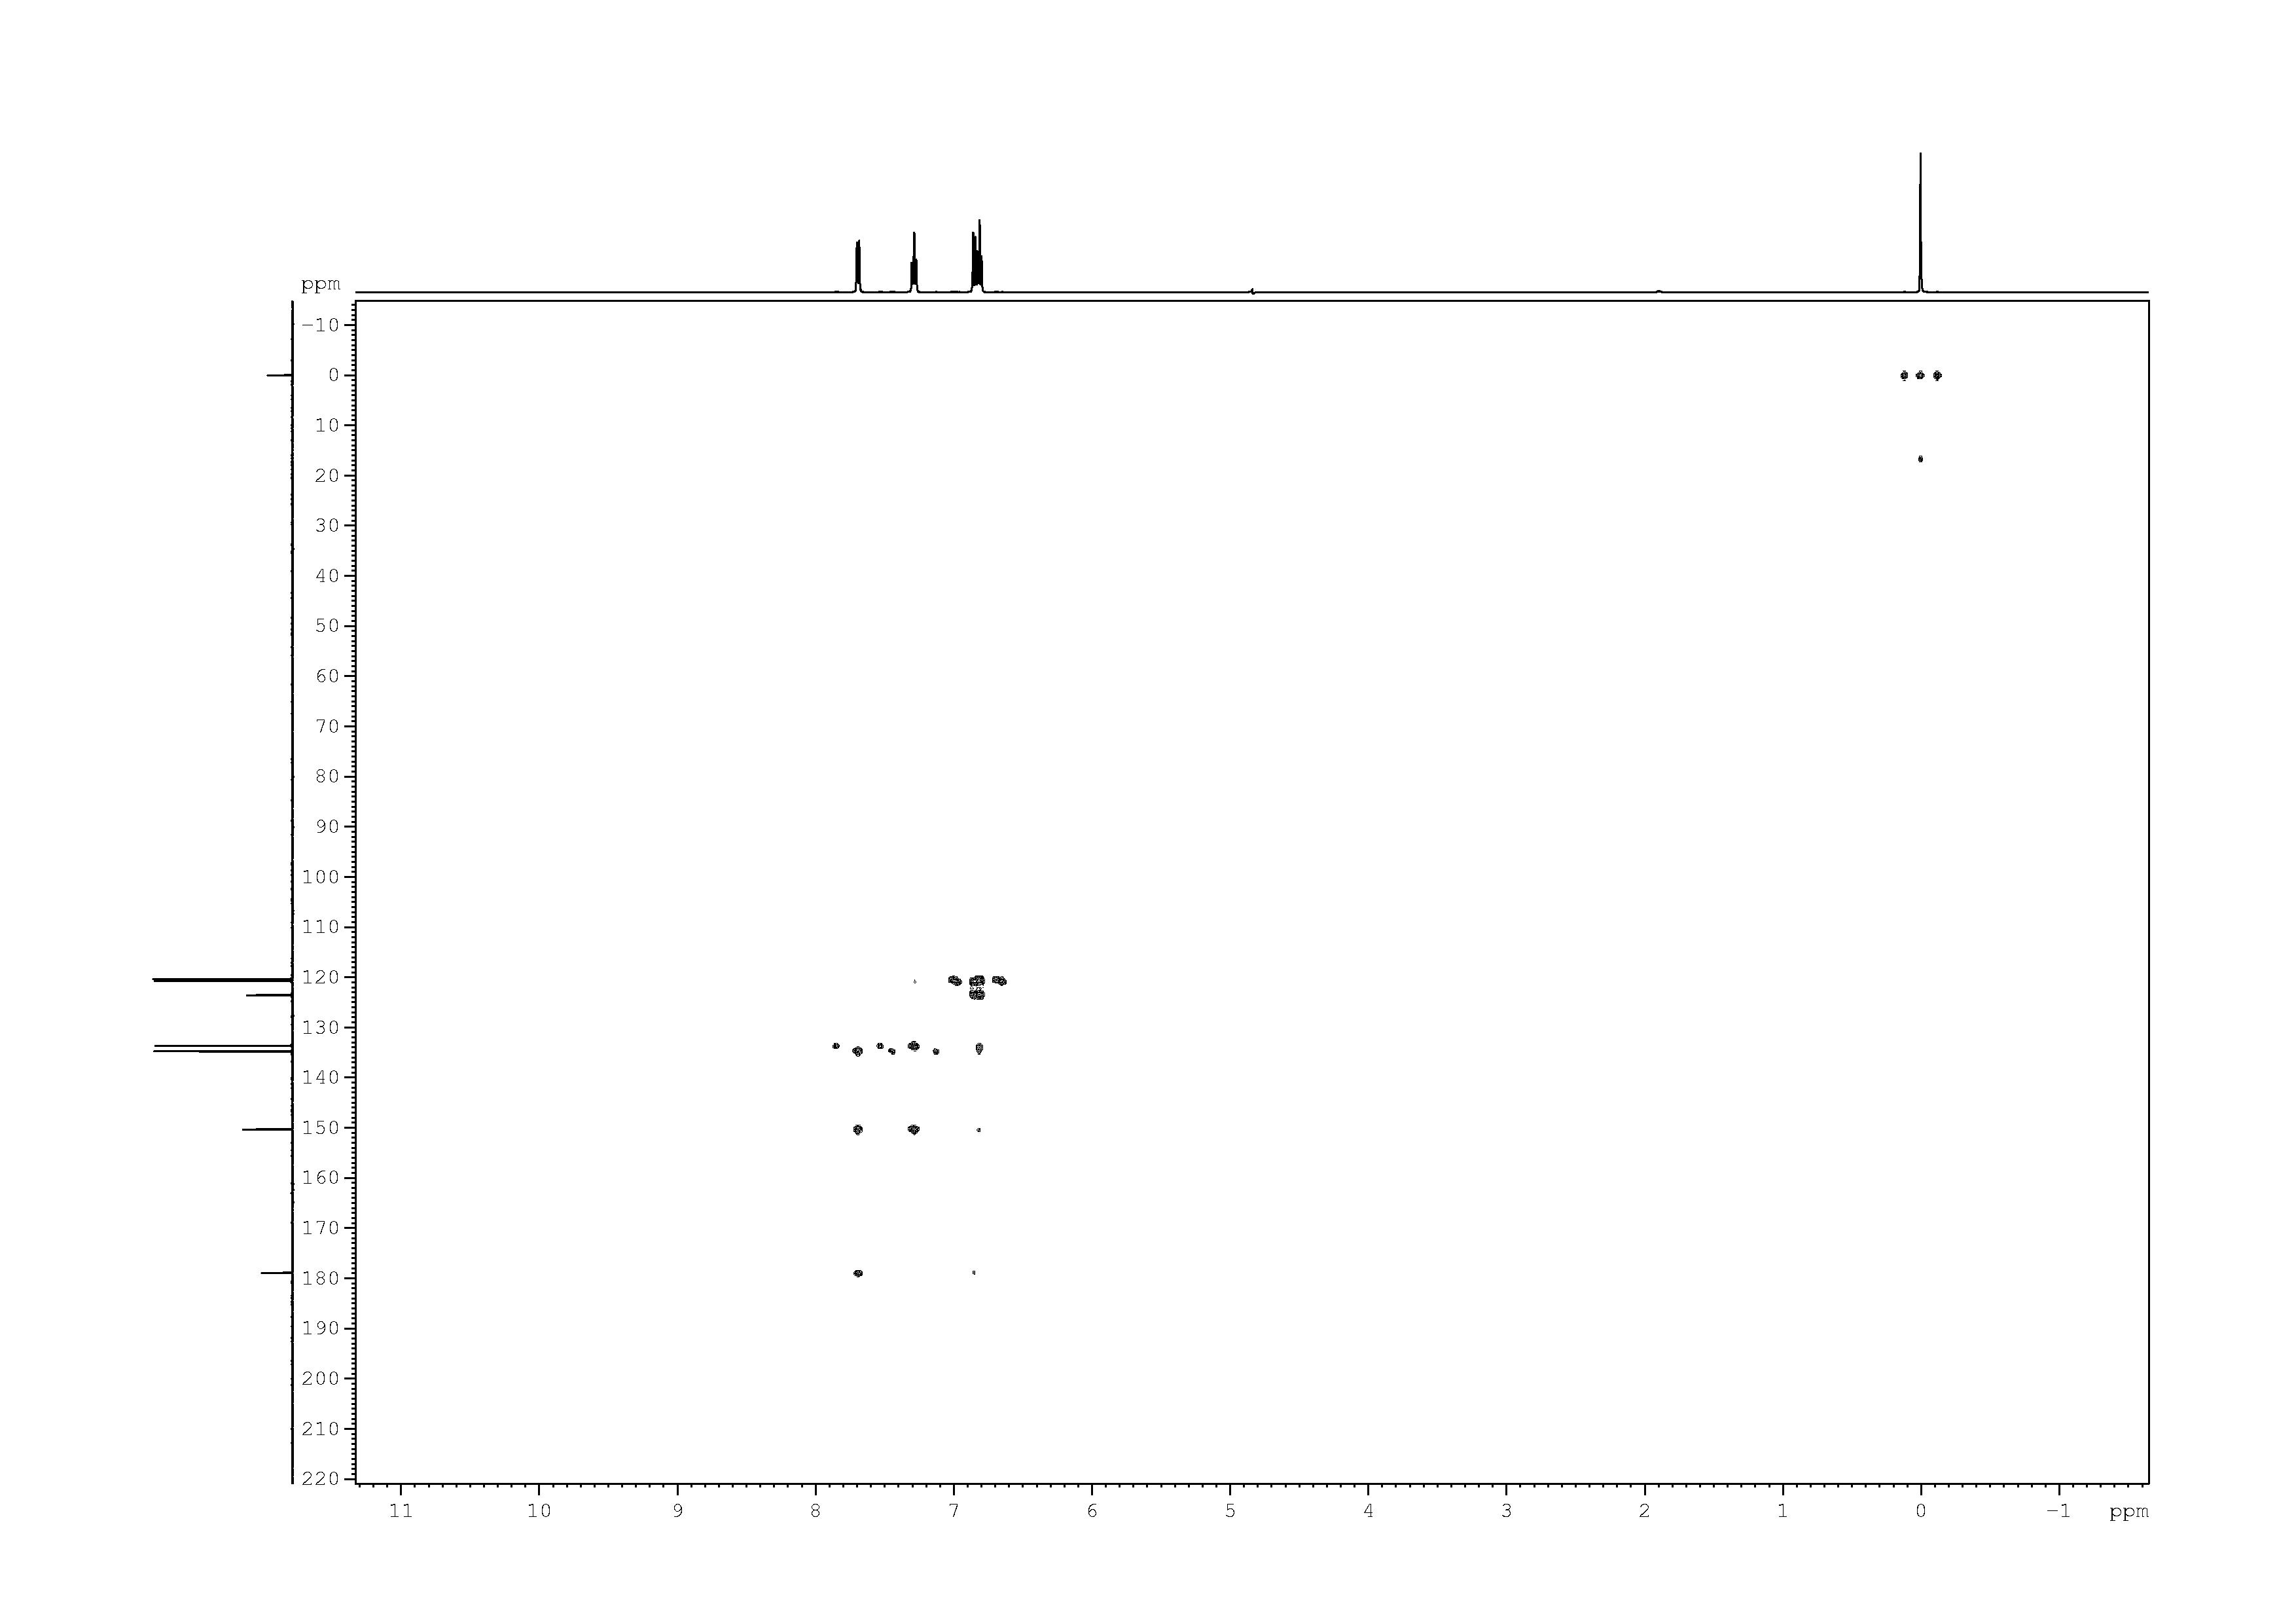 Bmse000067 Anthranilic Acid At Bmrb Free Volvo Wiring Diagrams Mirror 2d 1h13c Hmbc 74 Spectrum For